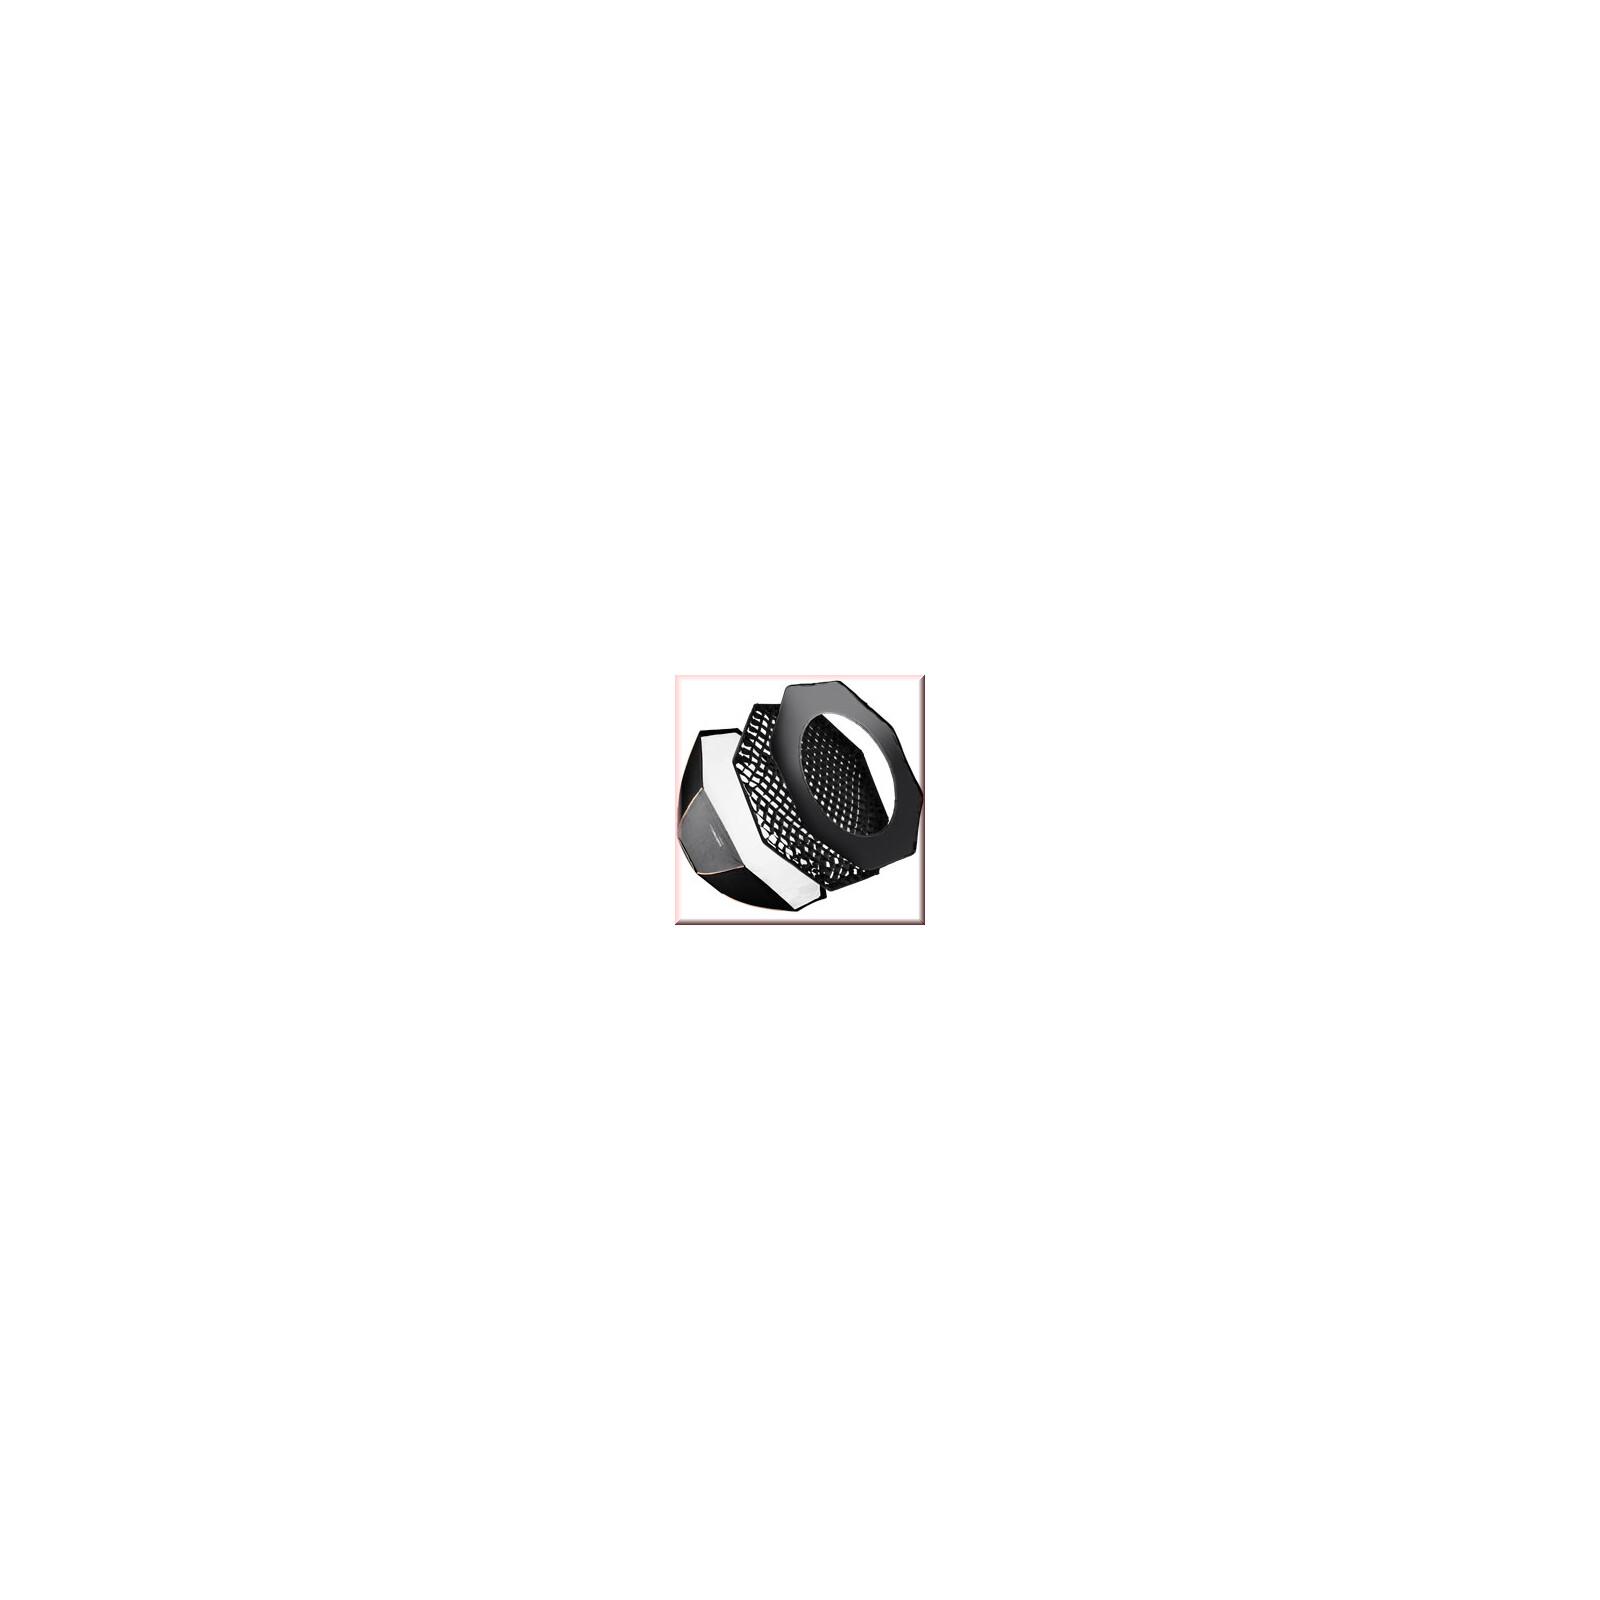 walimex pro Octa Softbox PLUS OL Ø213 Auro/Bowens